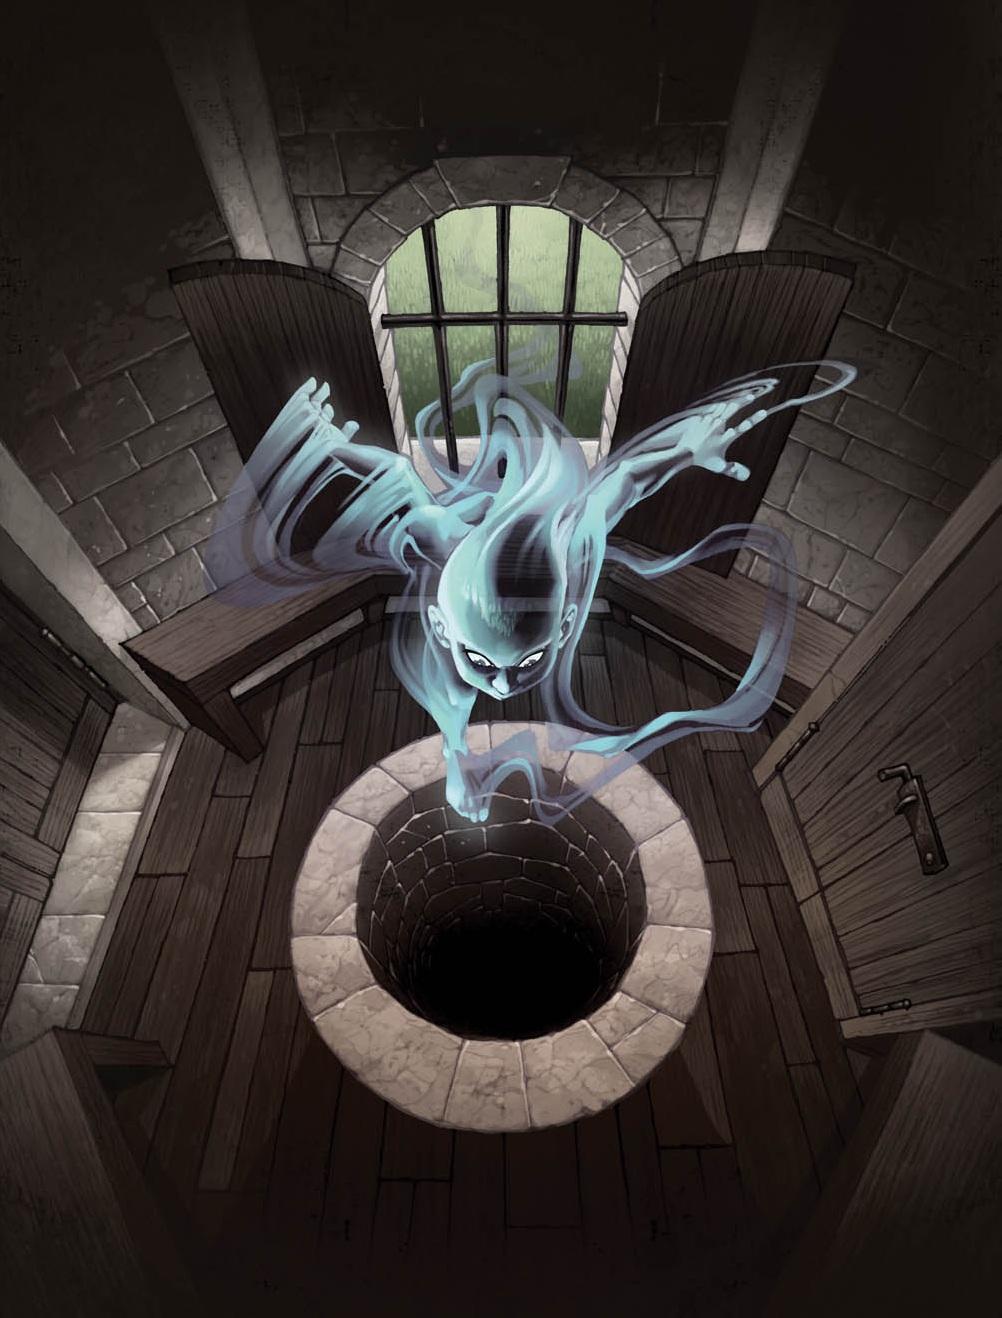 http://absolutezone.files.wordpress.com/2010/12/locke__key_welcome_to_lovecraft_2.jpg?w=1002&h=1318